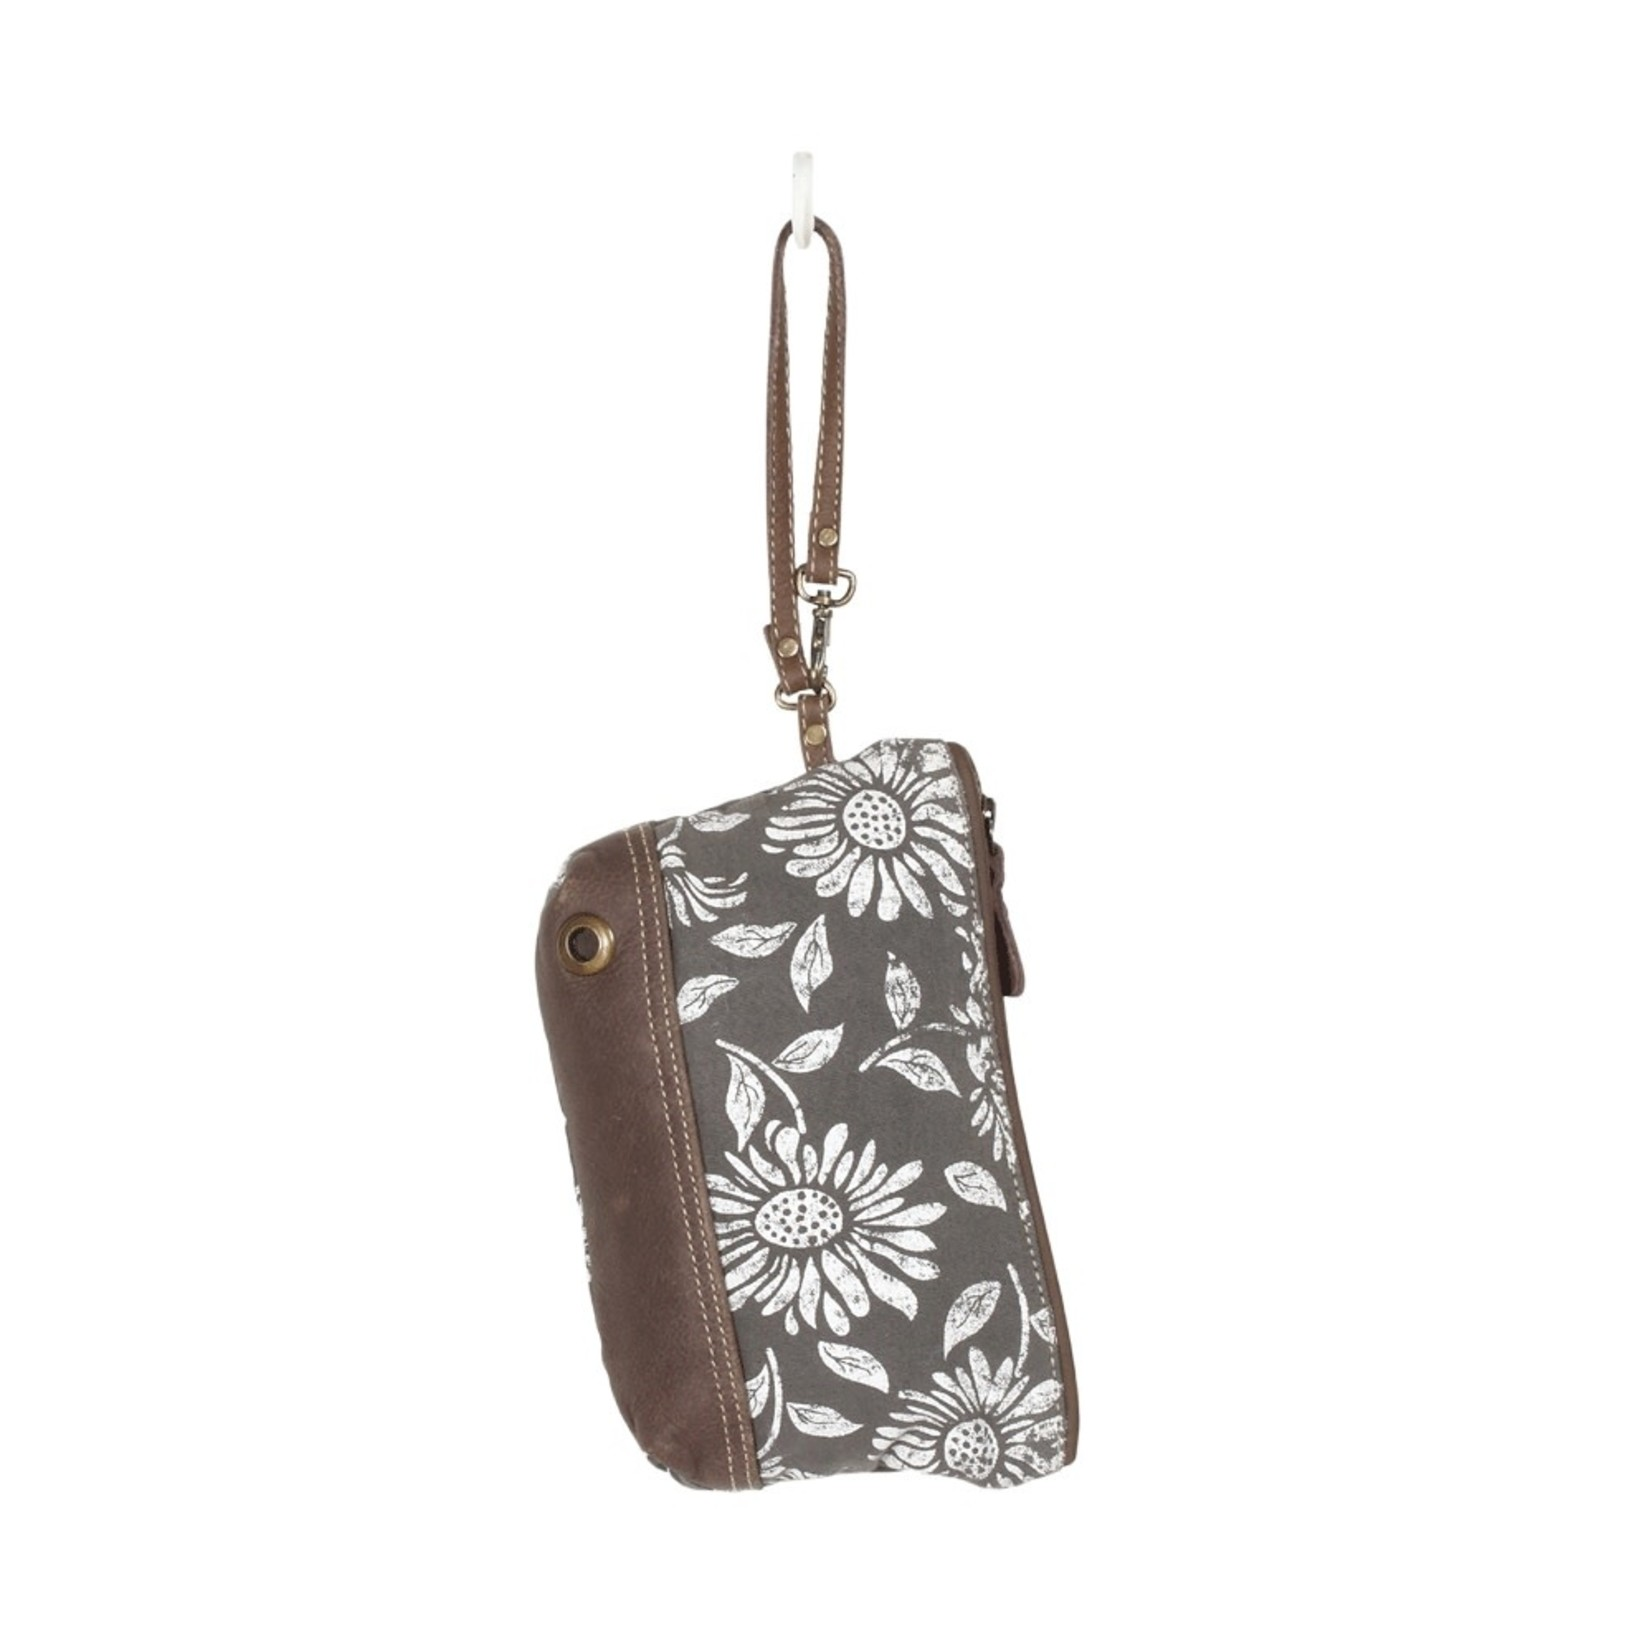 Myra Bags S-1286 Sunflower Wristlet